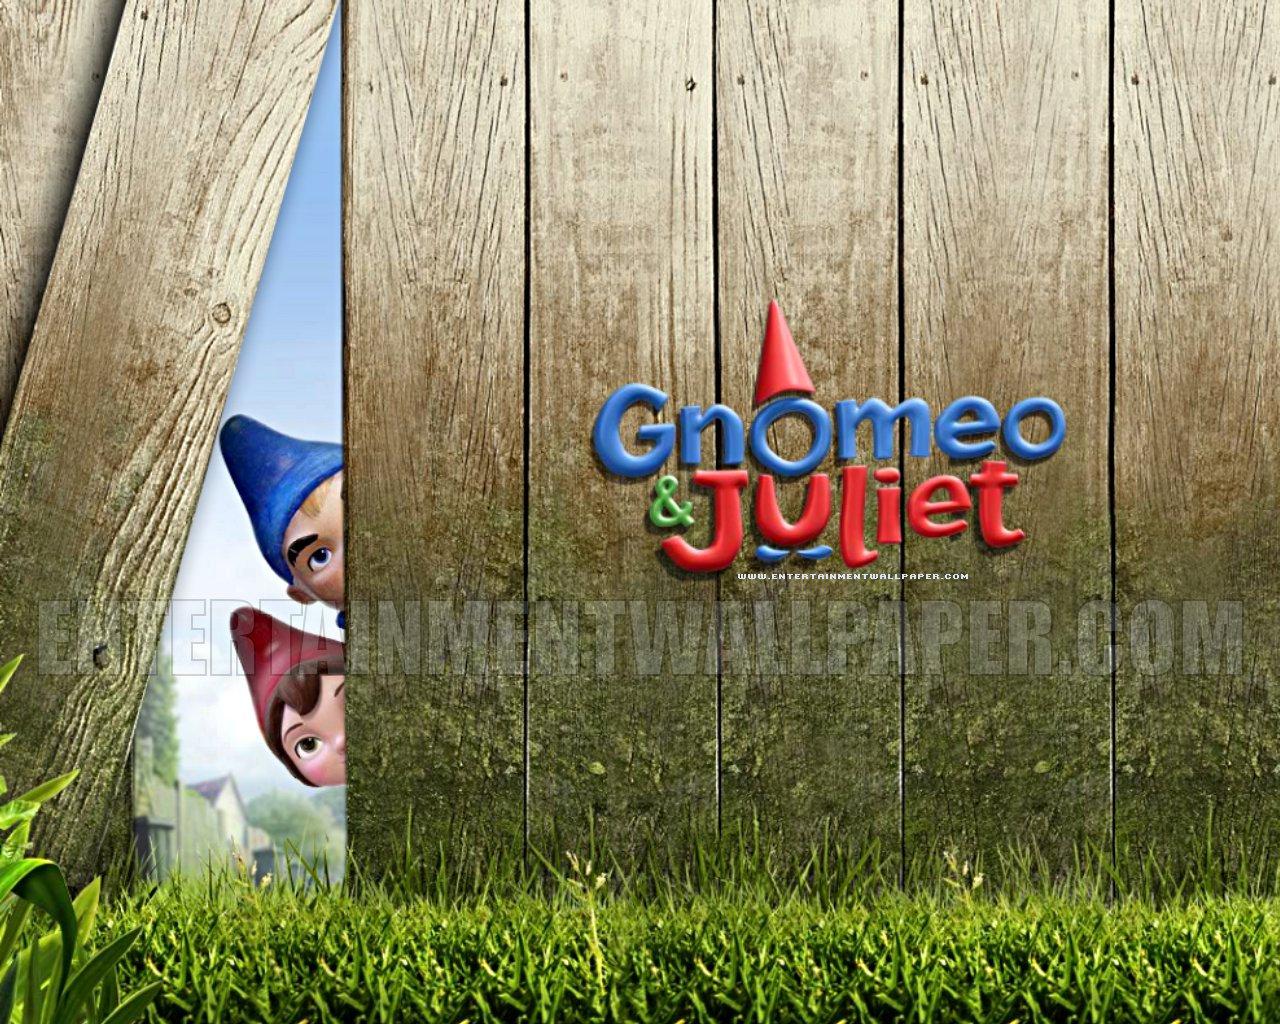 http://4.bp.blogspot.com/_84OLX7ypizY/TQQ7lTokaKI/AAAAAAAAAP0/2qLMtdFWo5Y/s1600/gnomeo_and_juliet01.jpg